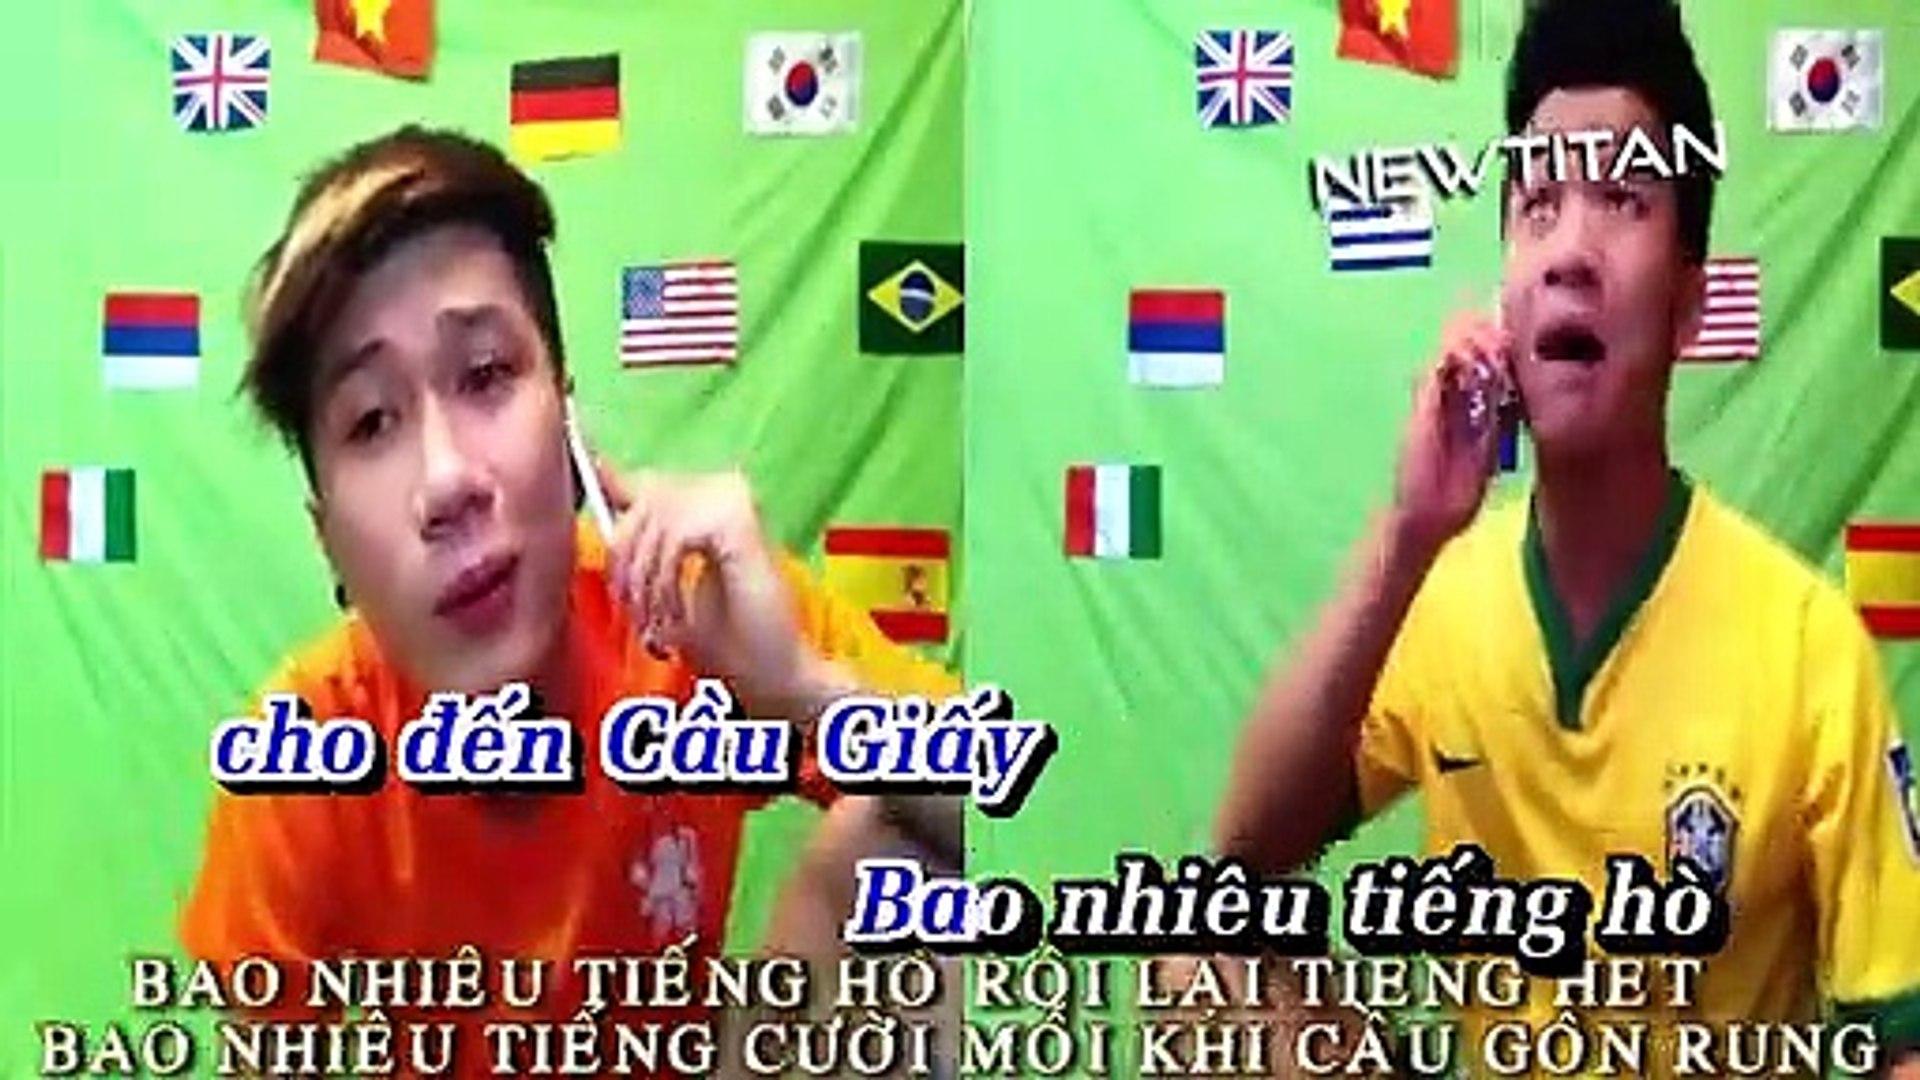 [Karaoke] Em Của Mùa World Cup - Leg Ft. Duy Nam [Beat]